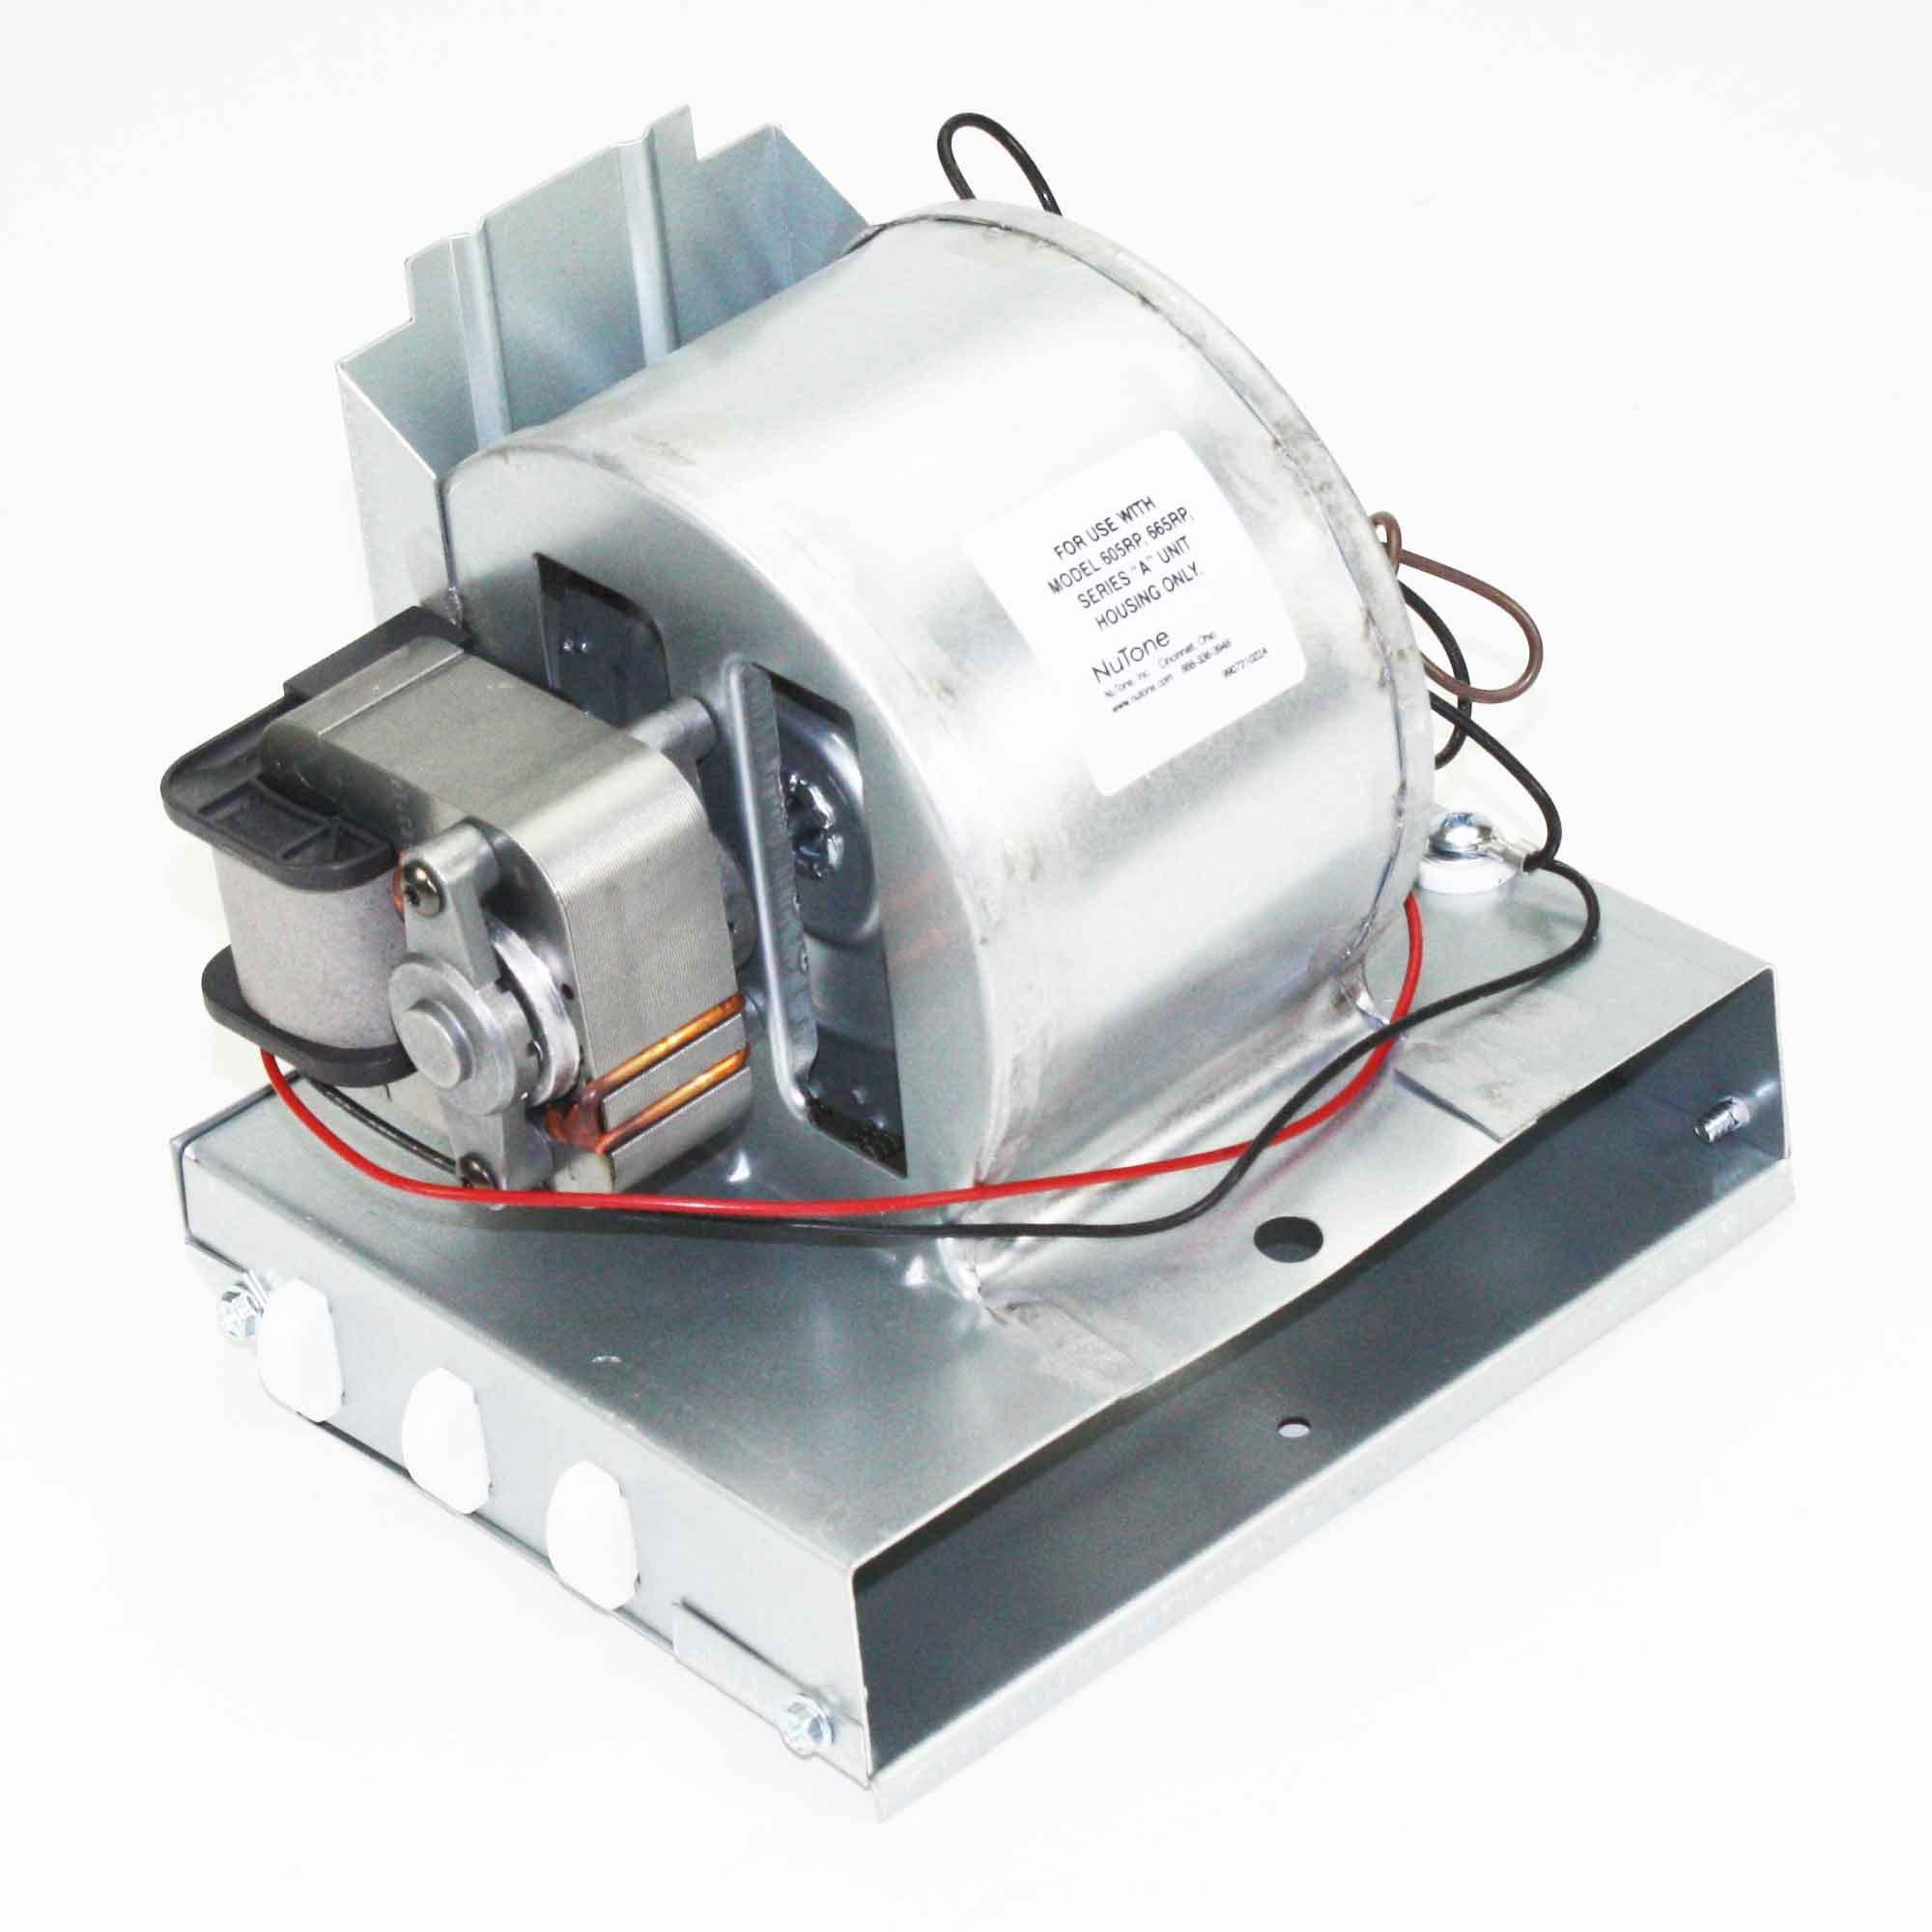 605RP & 665RP Broan Heater Assembly # 97017648; 0.9 amps, 120V 60hz.